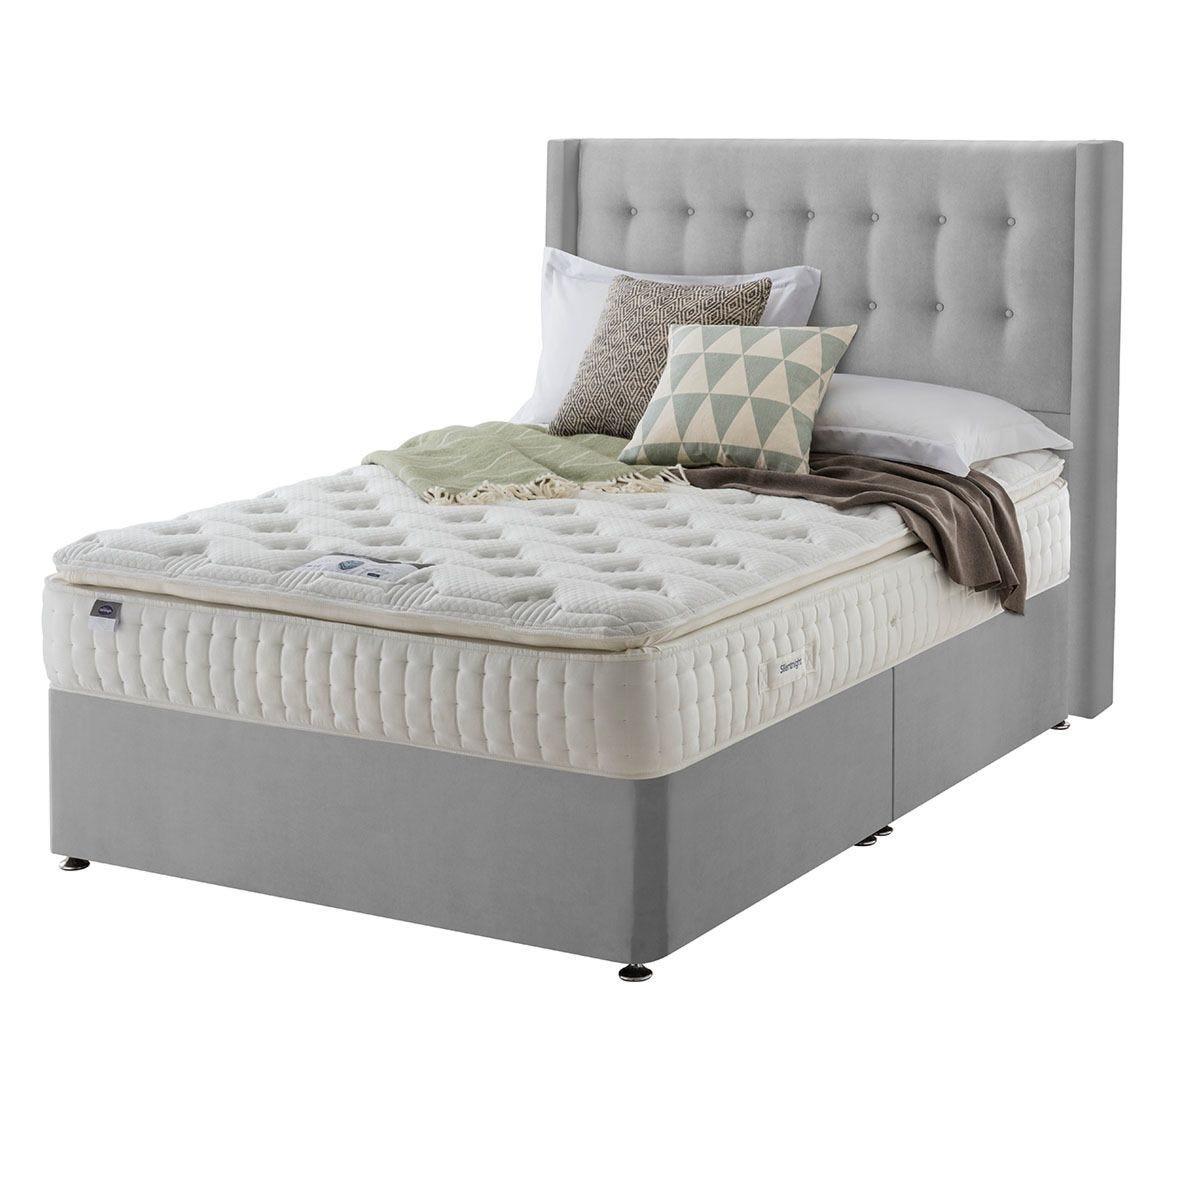 Silentnight Mirapocket Latex 1000 Non Storage Divan Bed - Velvet Silver King